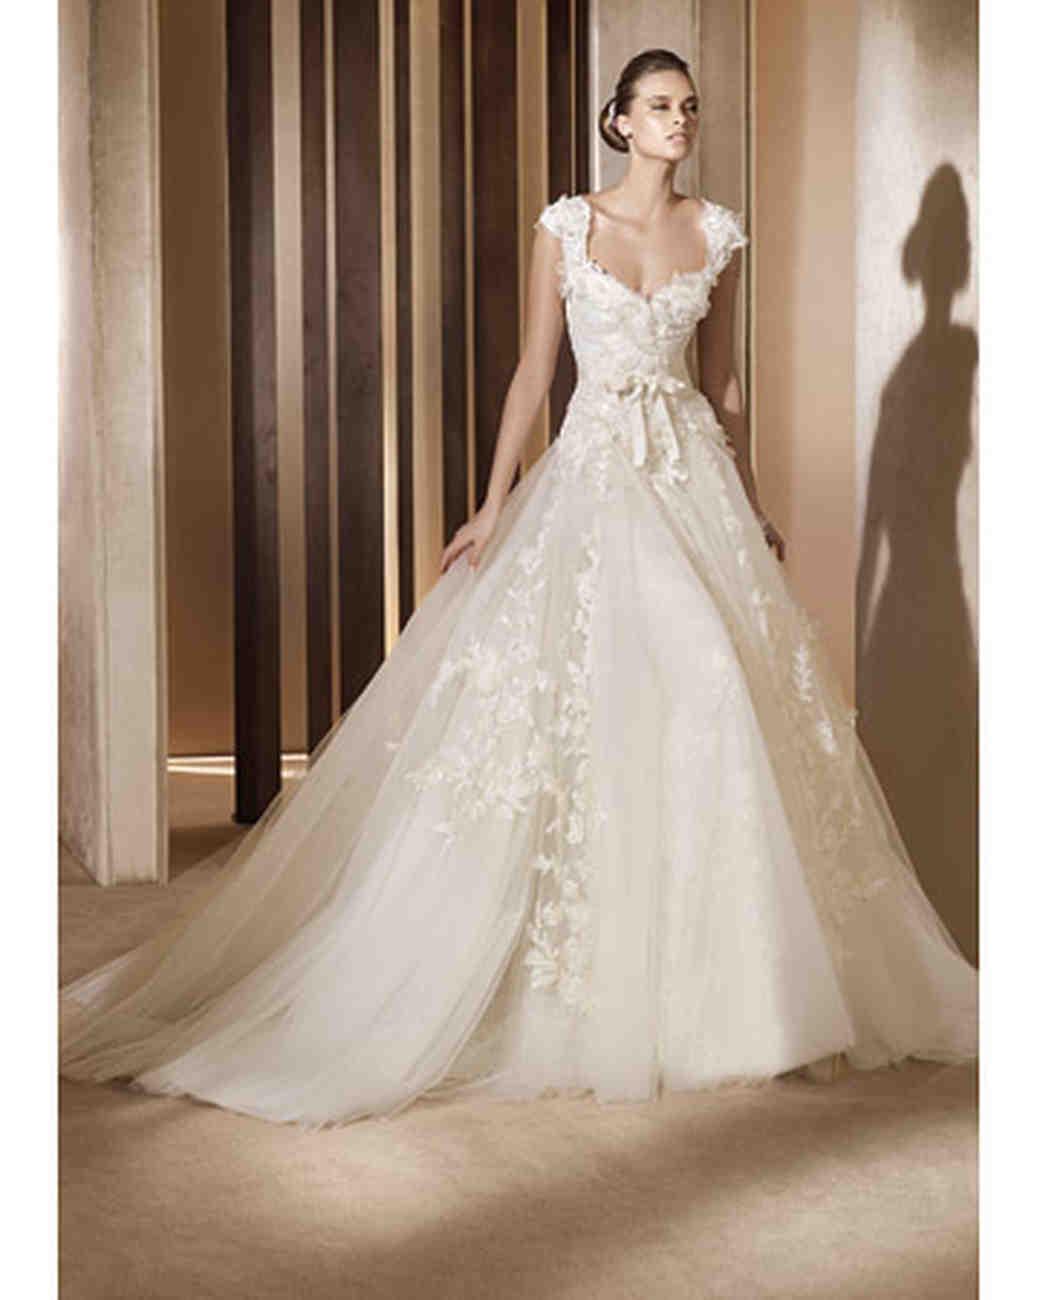 elie saab fall collection elie saab wedding dress Ball Gown